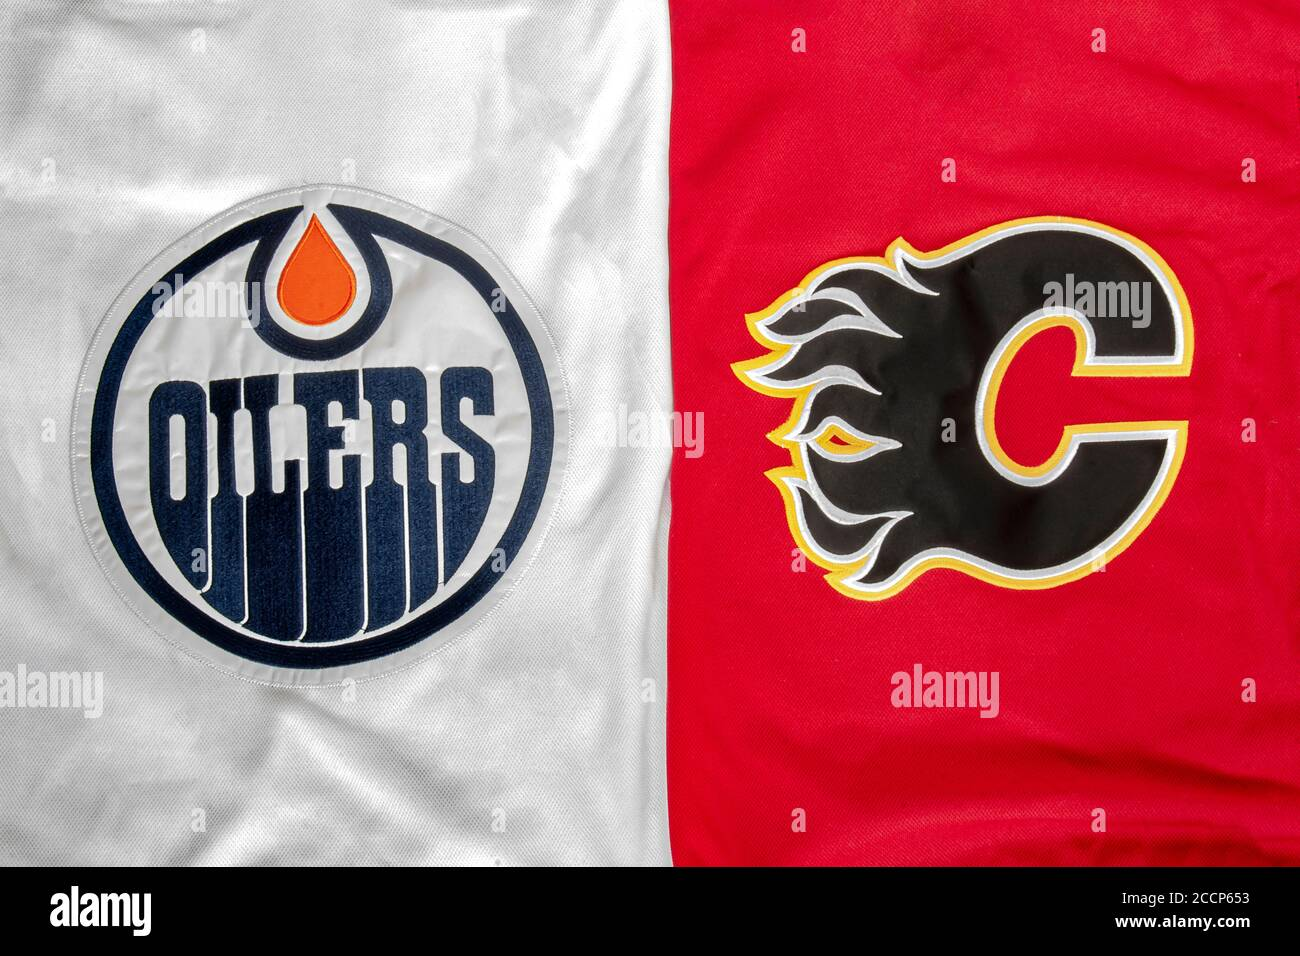 Calgary Alberta Canada Aug 23 2020 A Close Up To A Nhl Edmonton Oilers Vs Calgary Flames Hockey Jersey Stock Photo Alamy